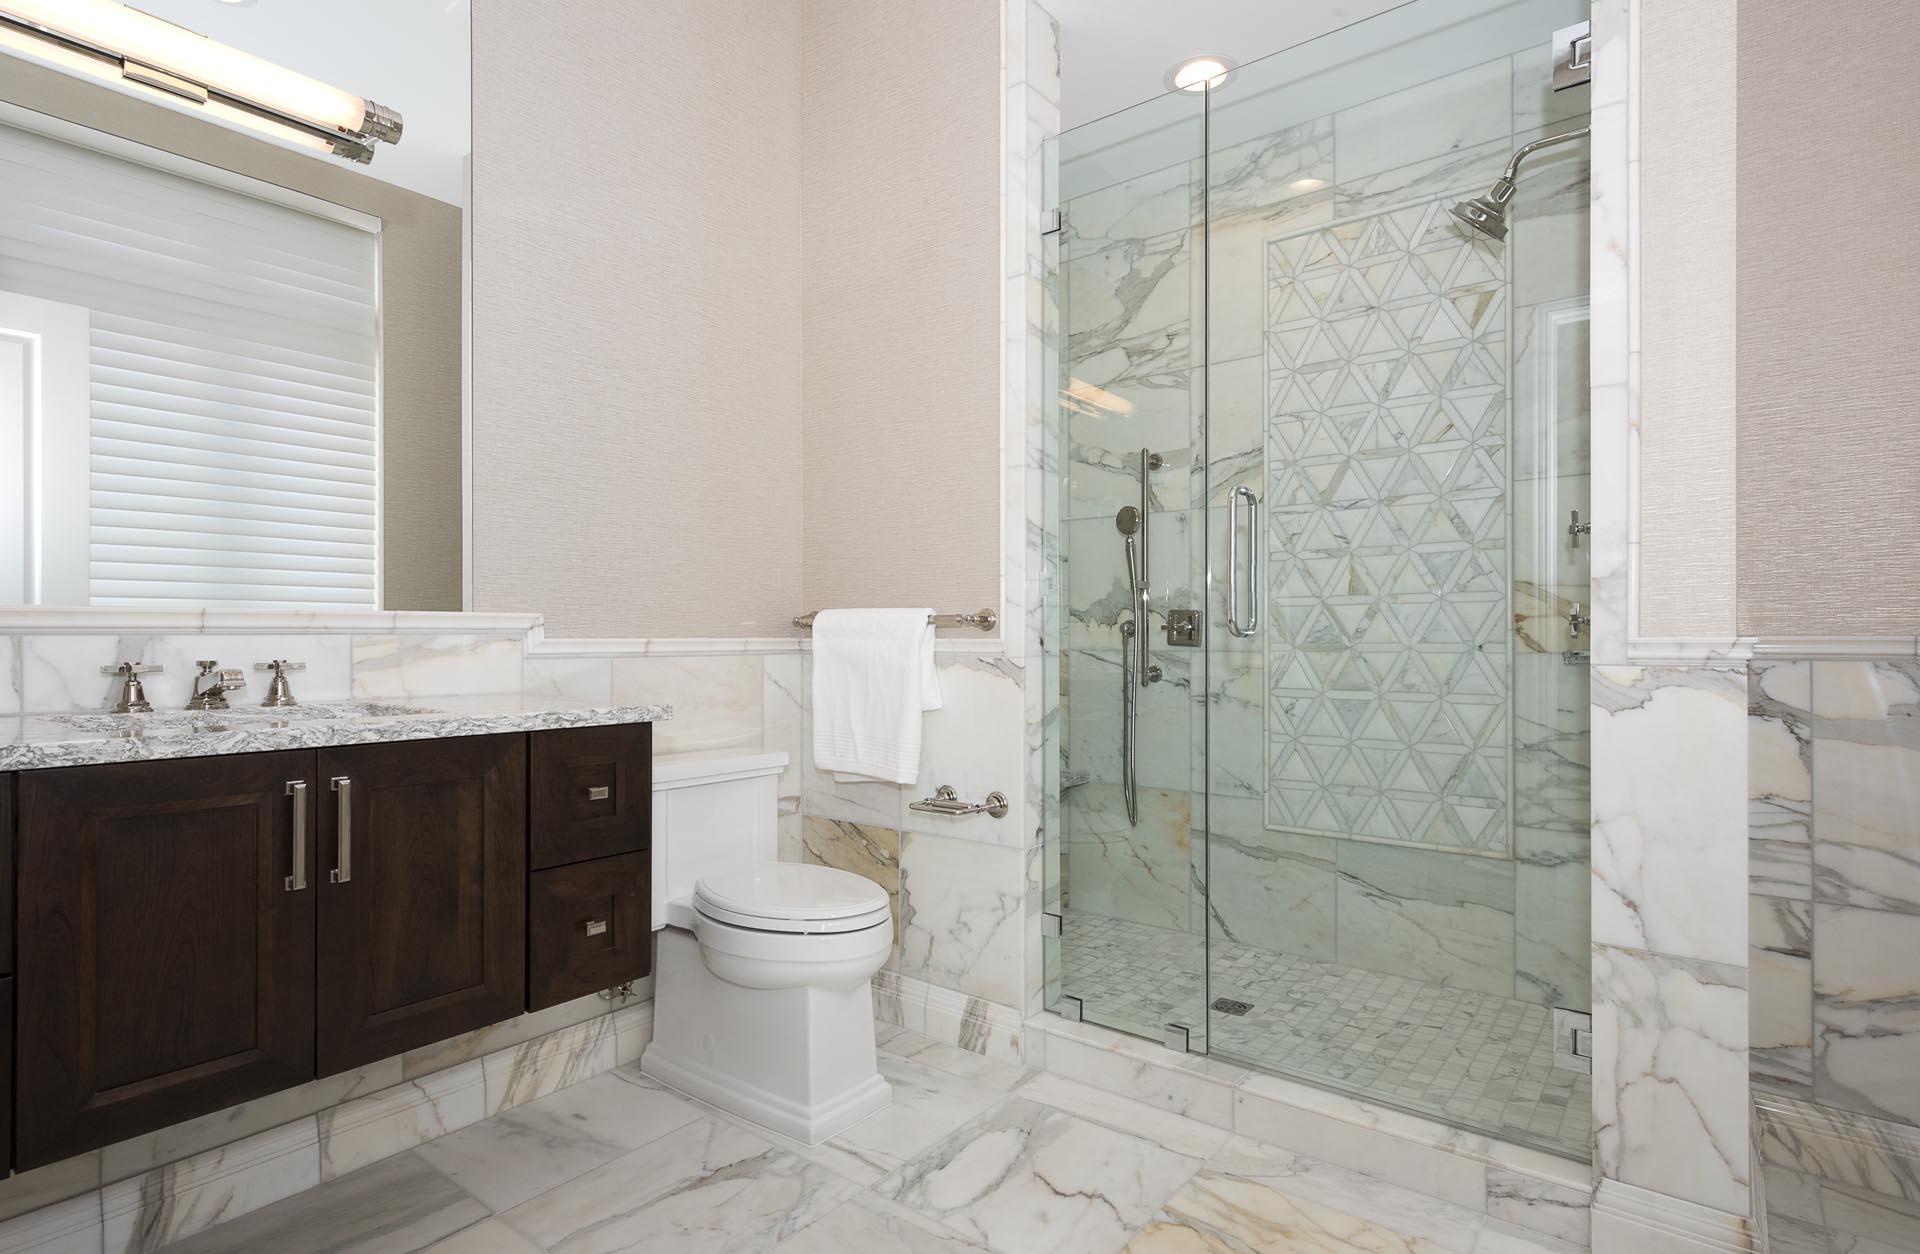 Condo Shower Design | H Residence | Midland, MI